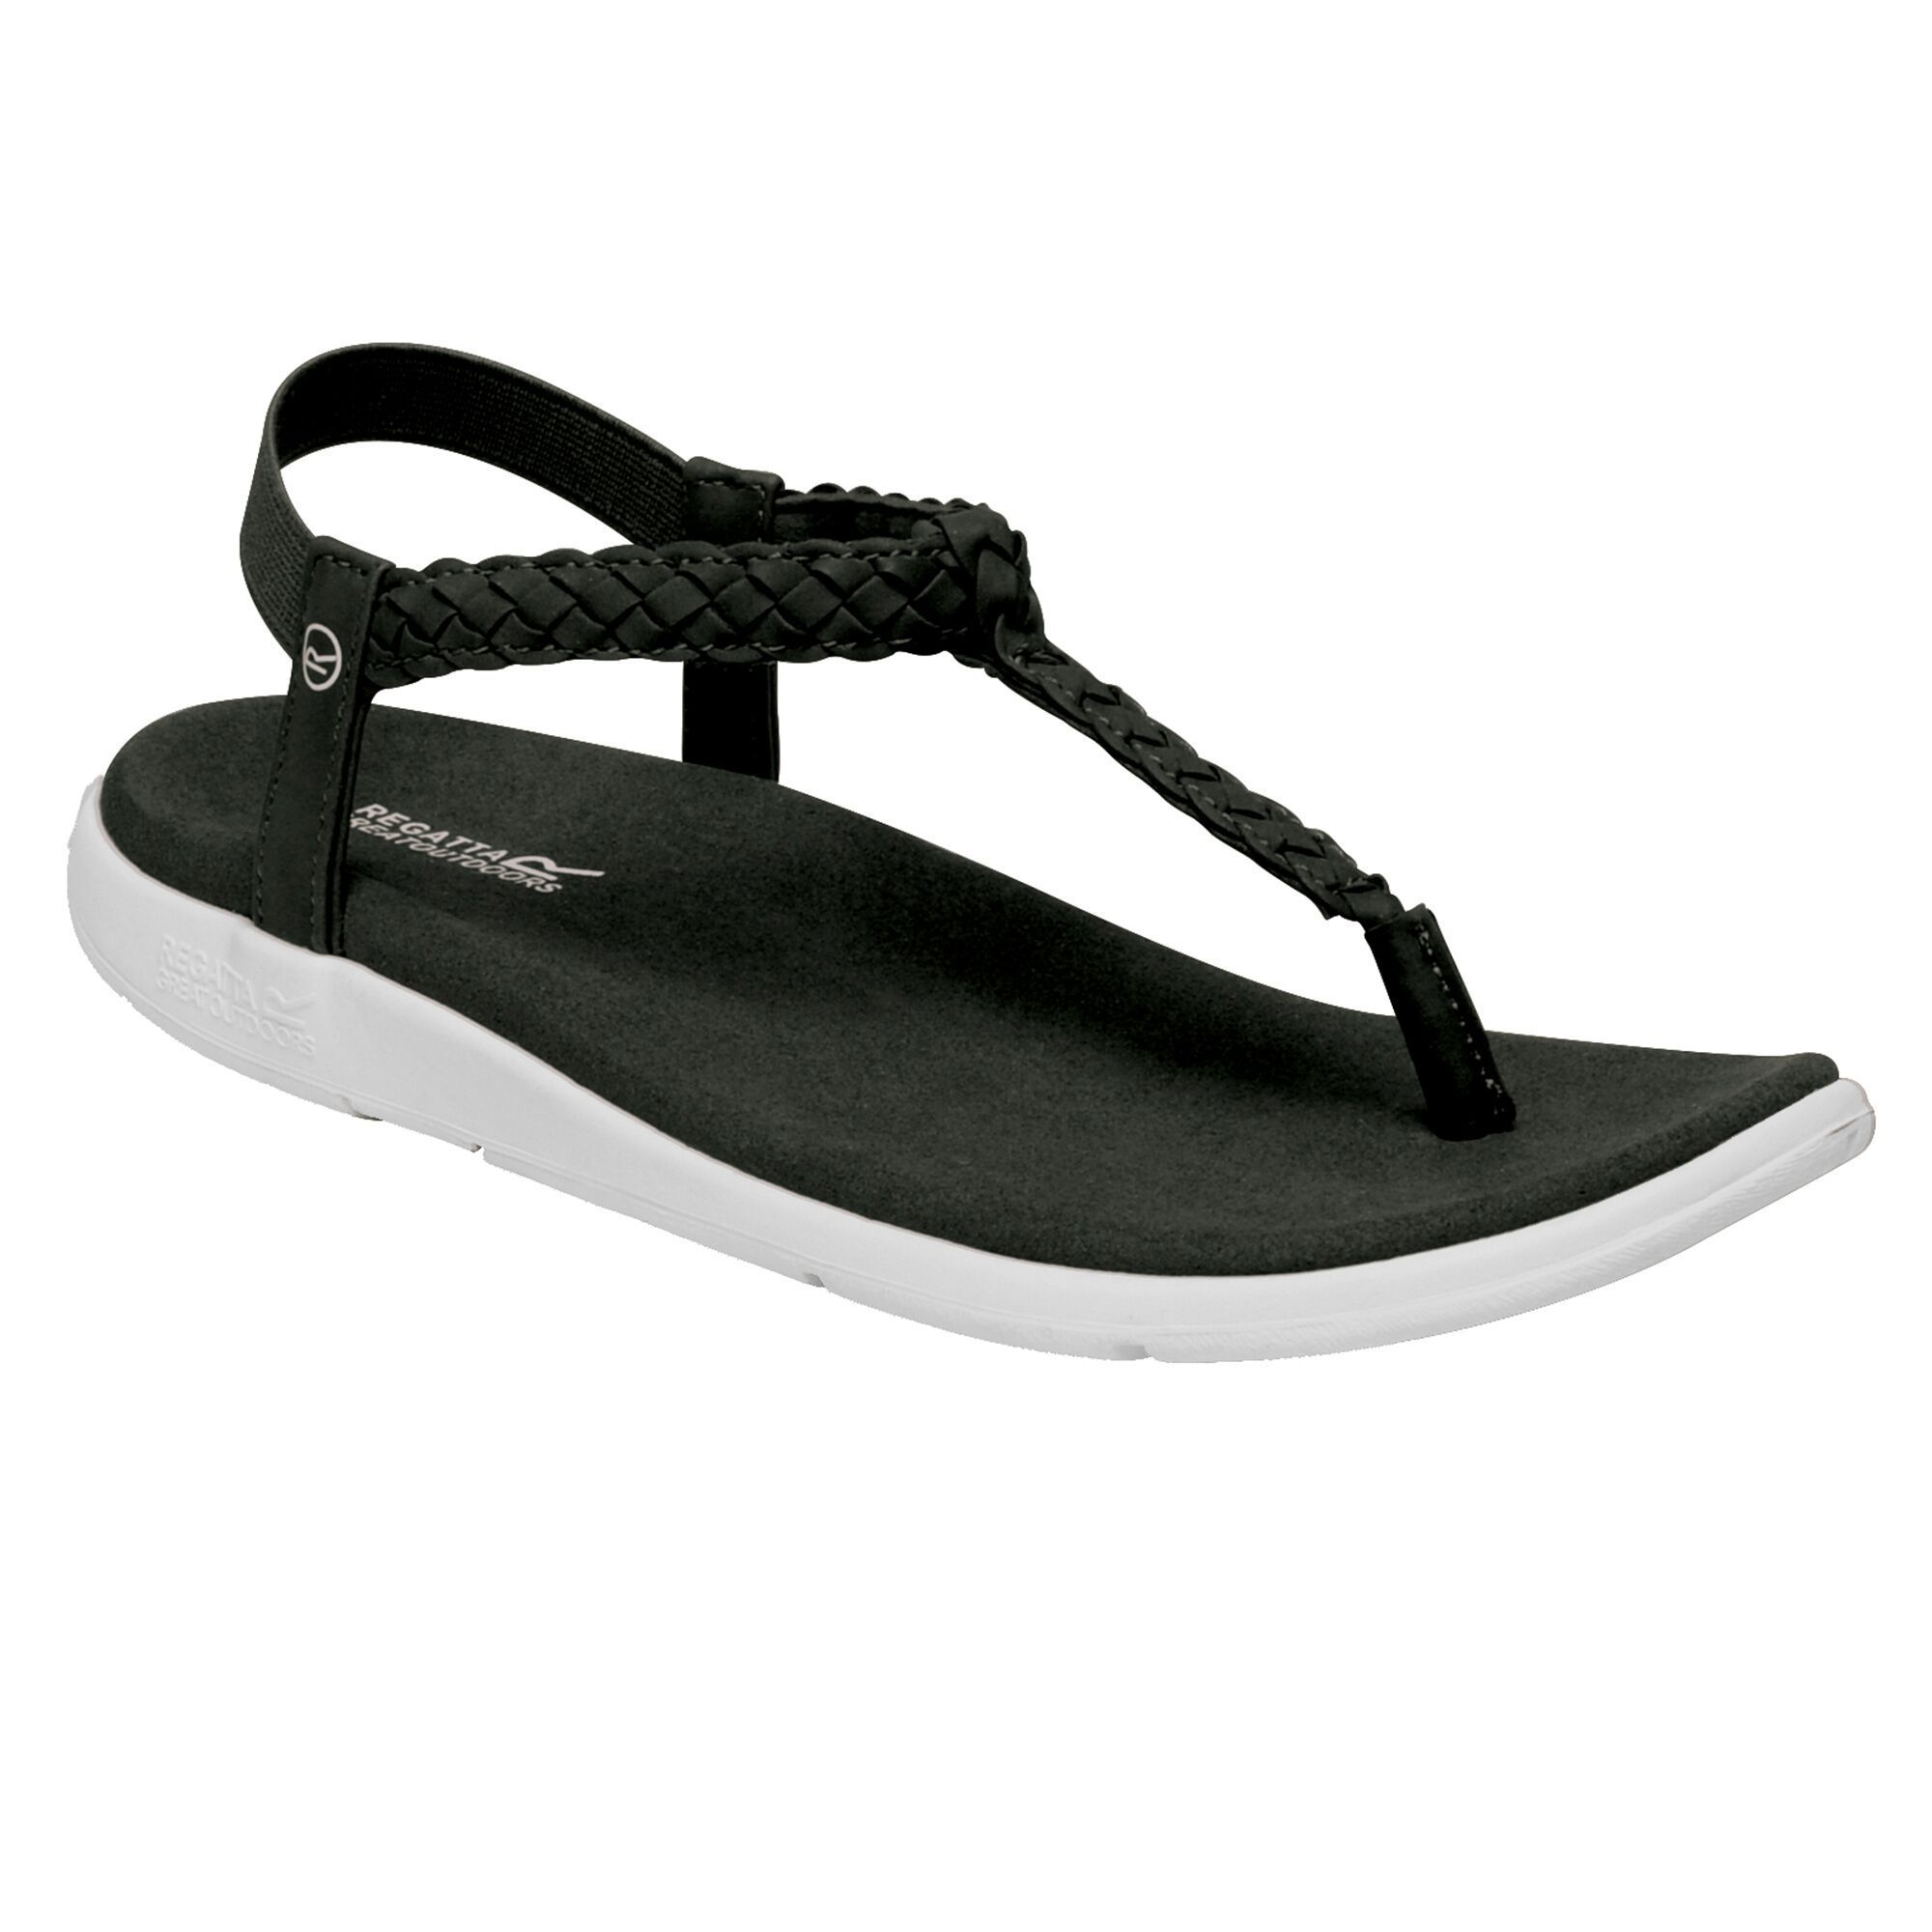 Regatta Womens/Ladies Santa Luna Braided Sandals